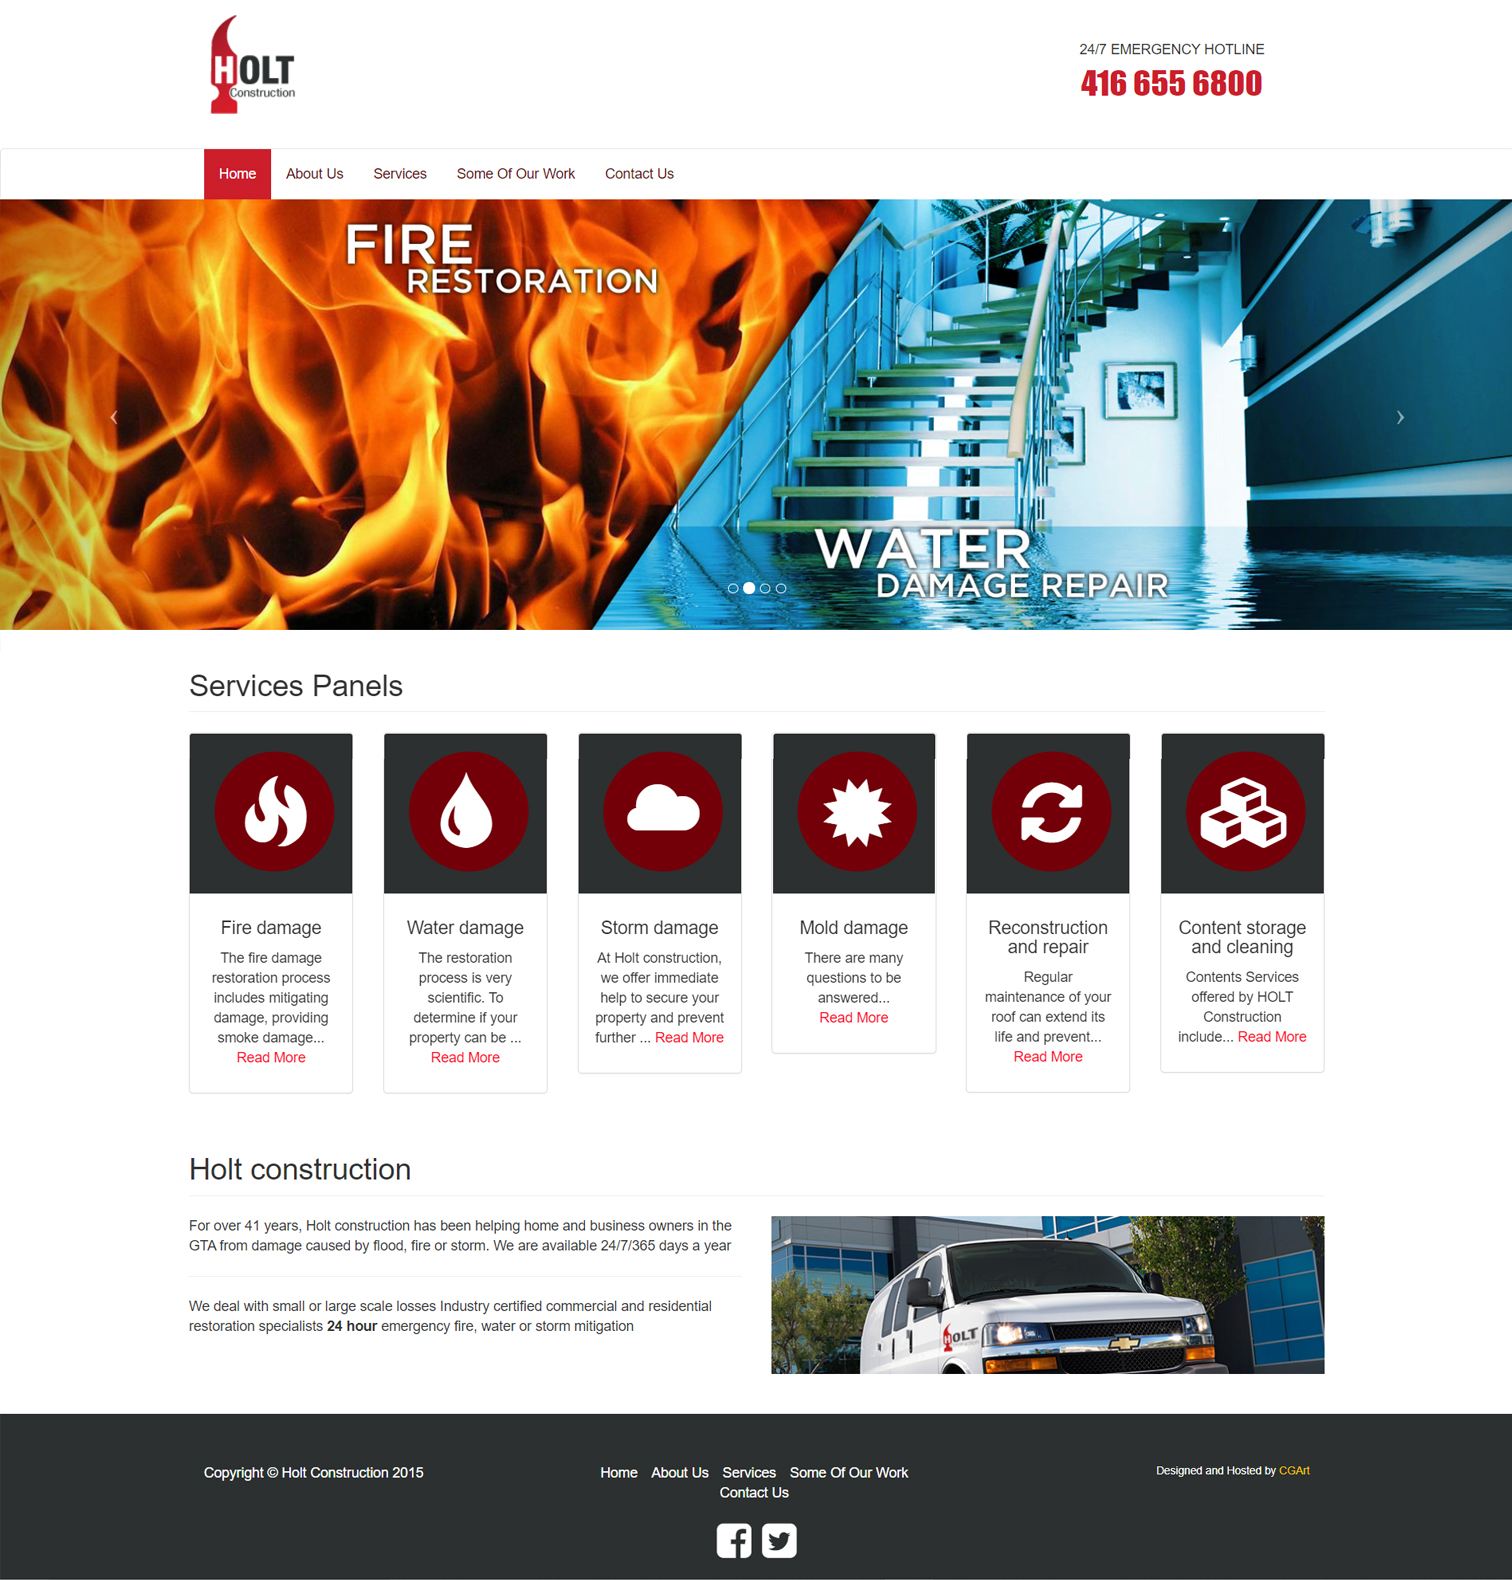 Holt-CGArt-Web-design